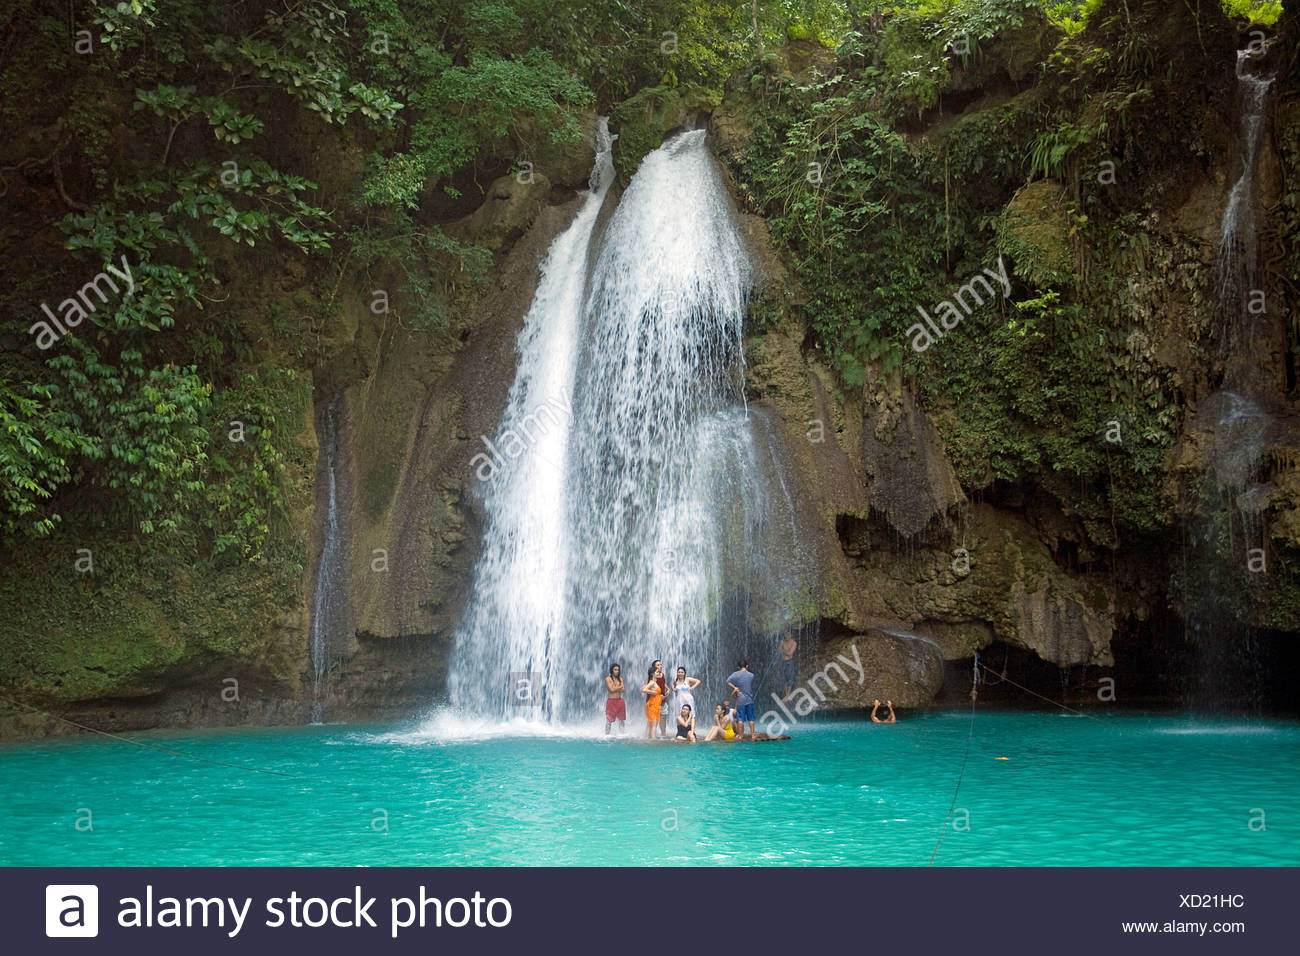 Kawasan Falls, Cebu, Philippines, Indo-Pacific region, Asia - Stock Image